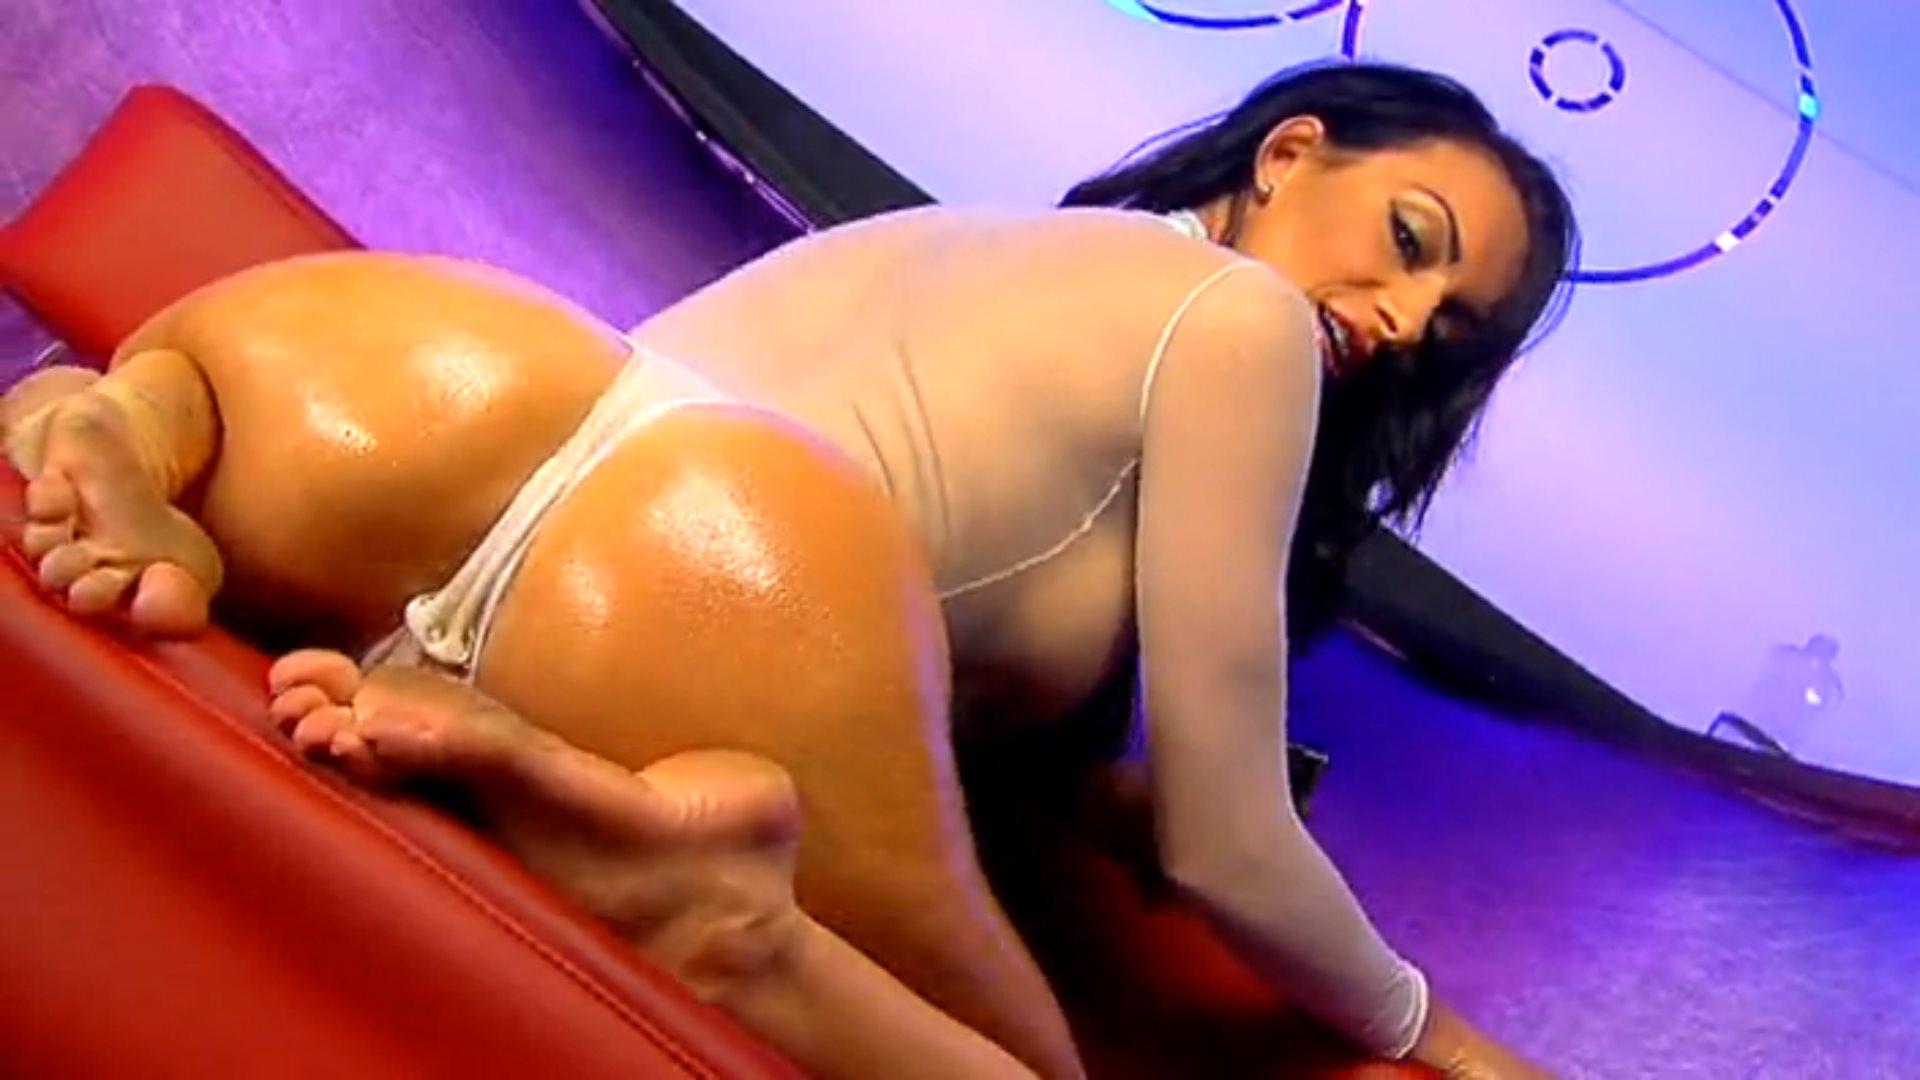 Sheree wilson nude pics